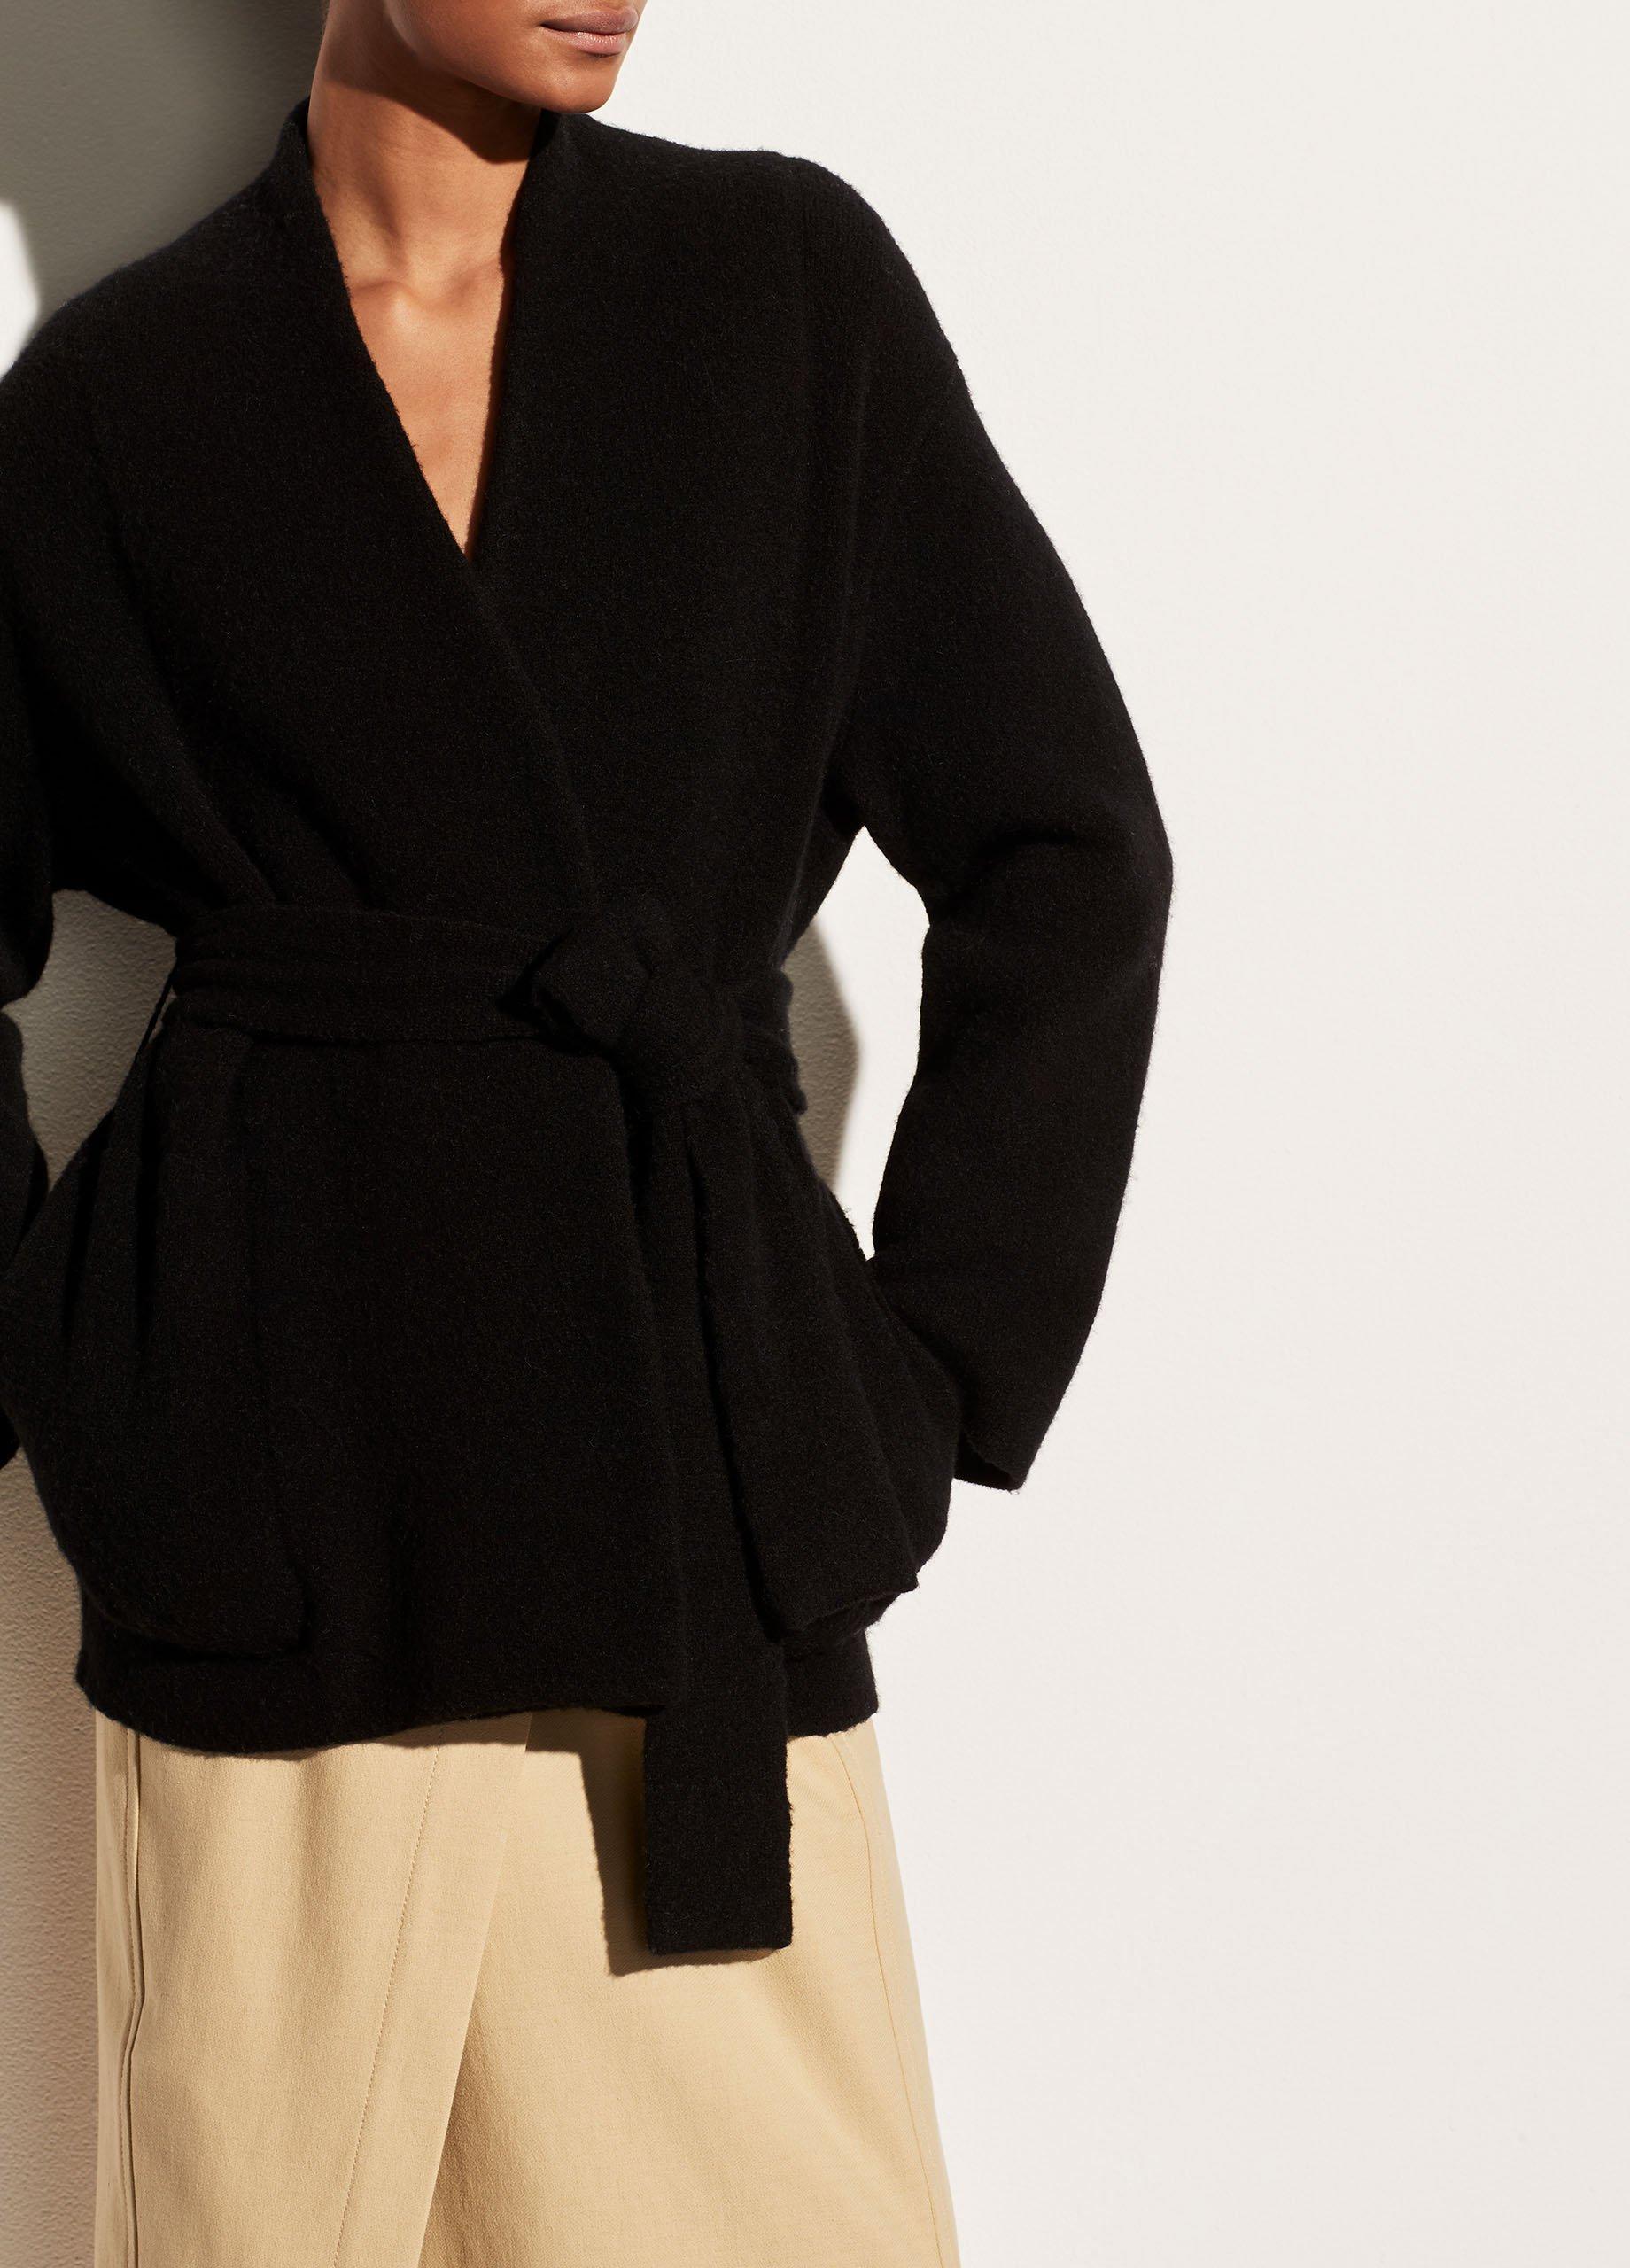 Belted Cardigan Coat